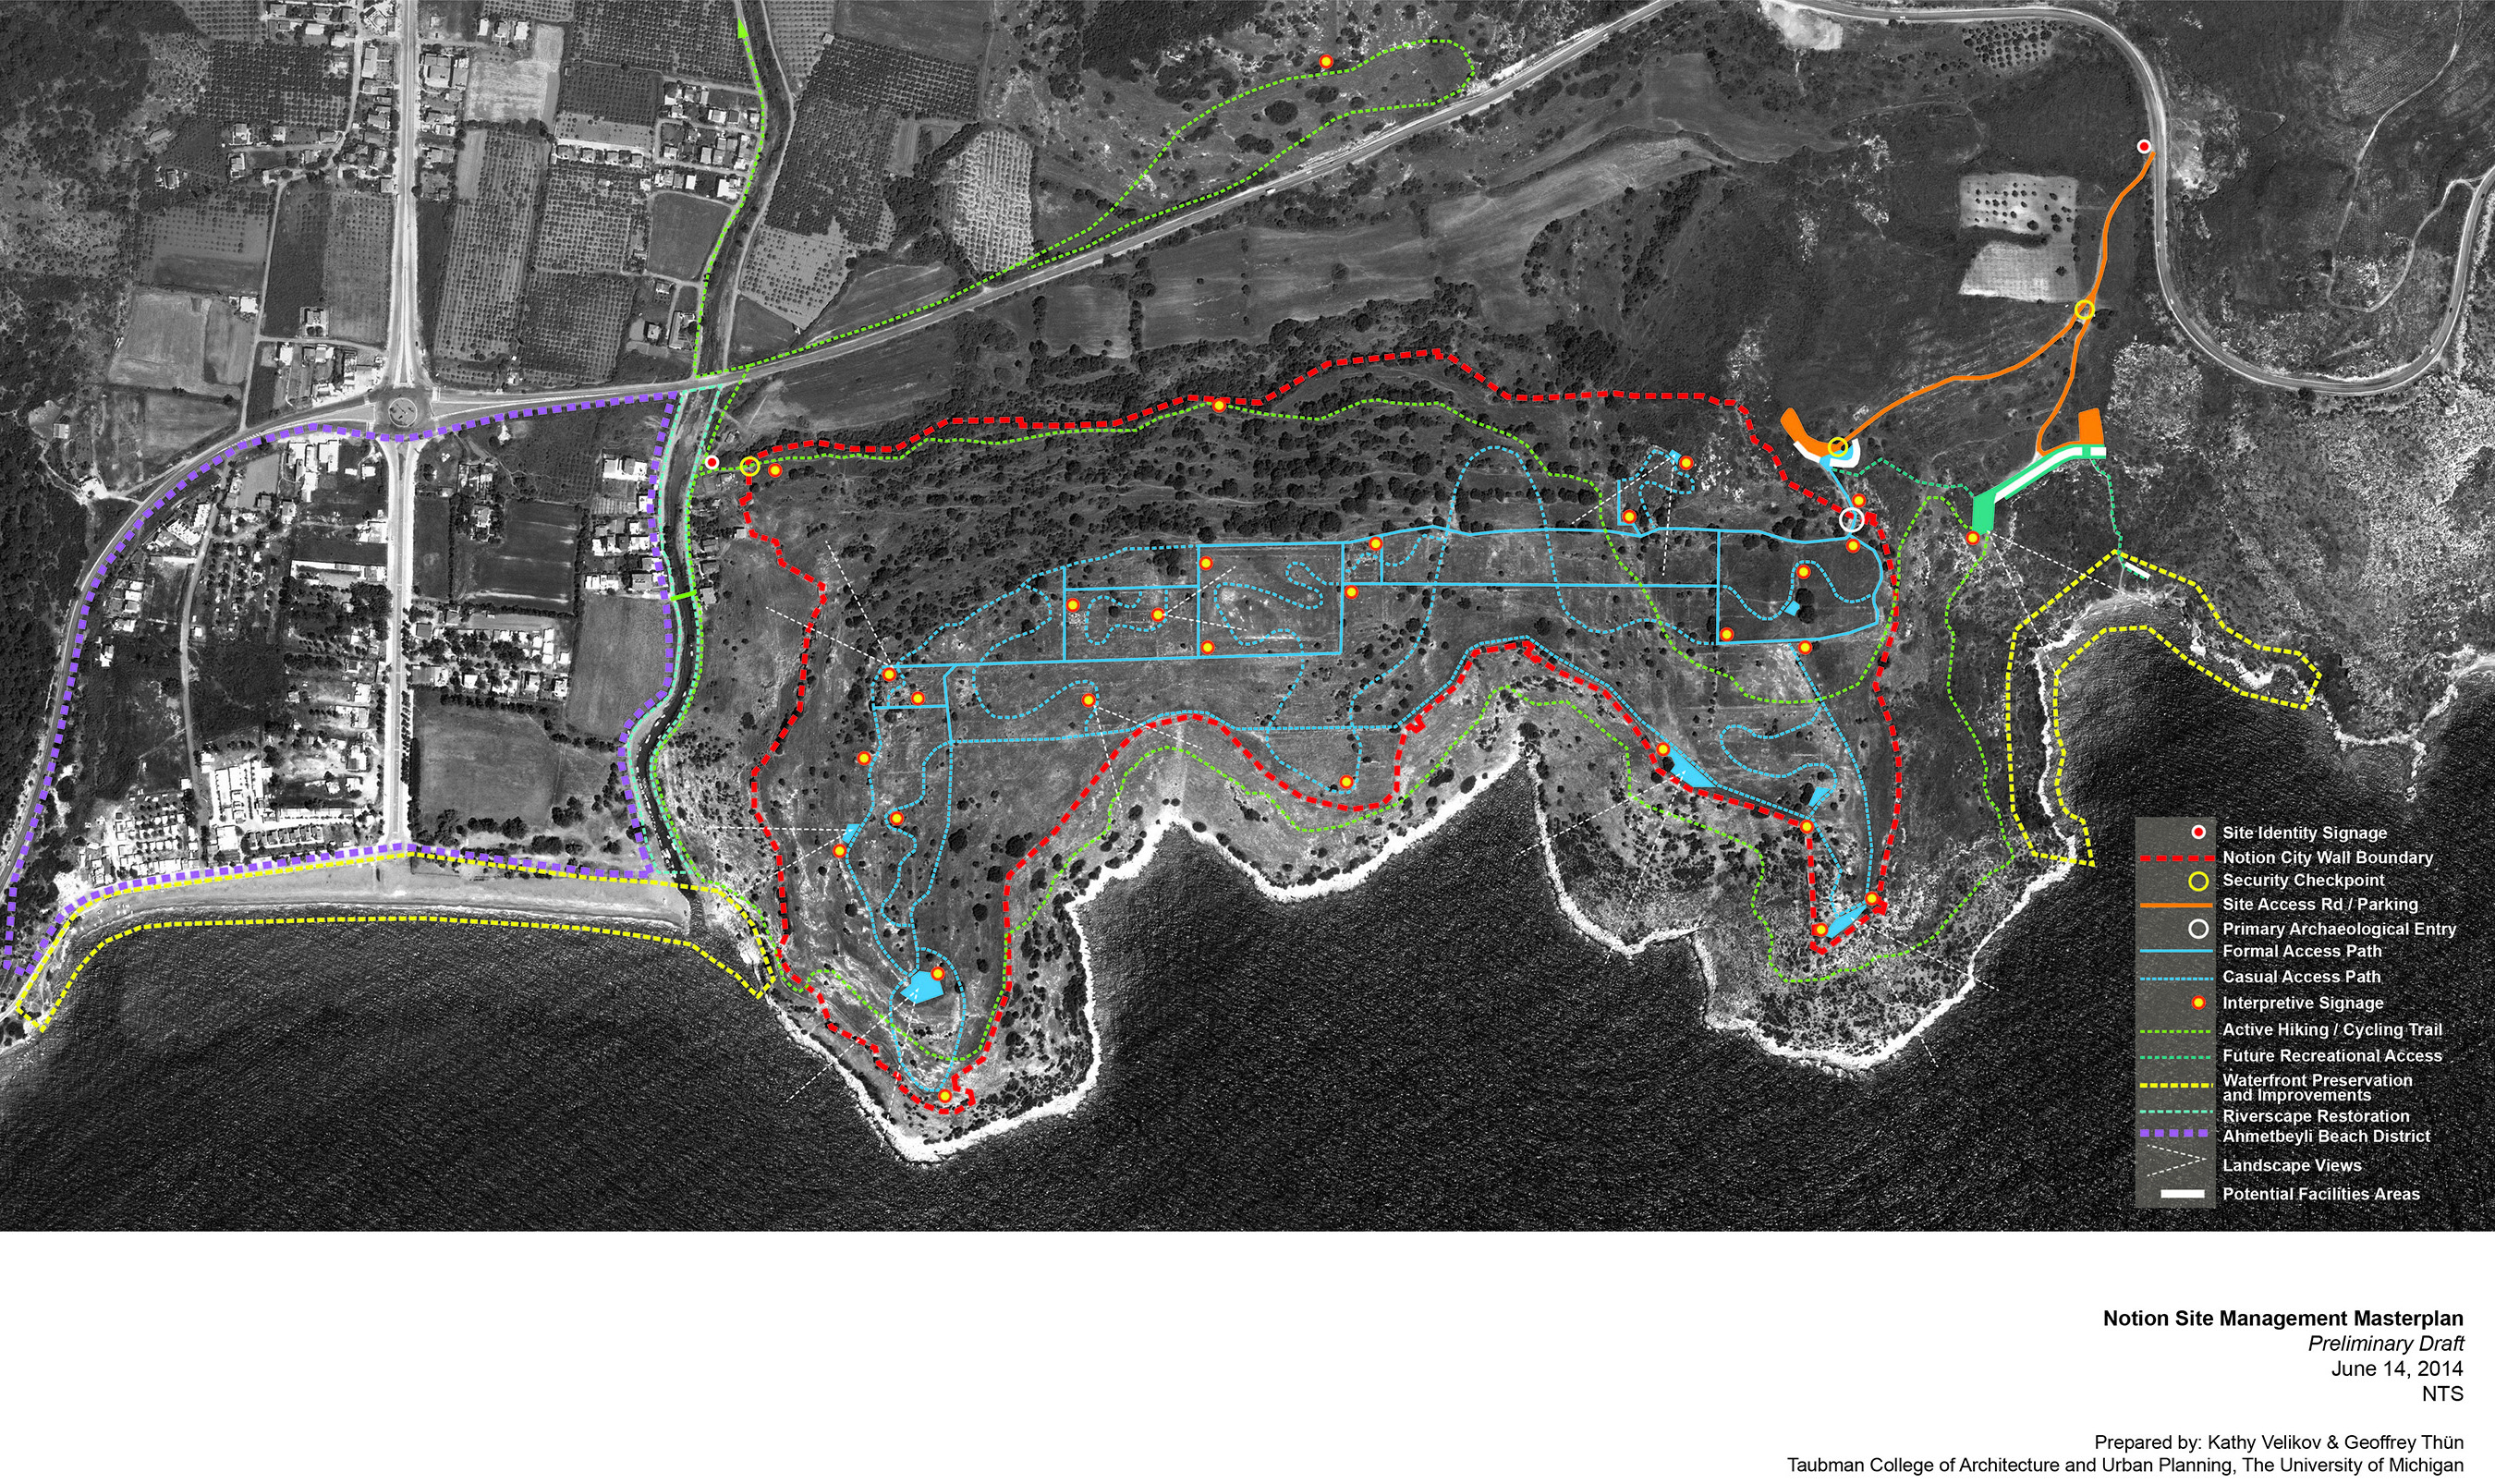 Preliminary site management plan